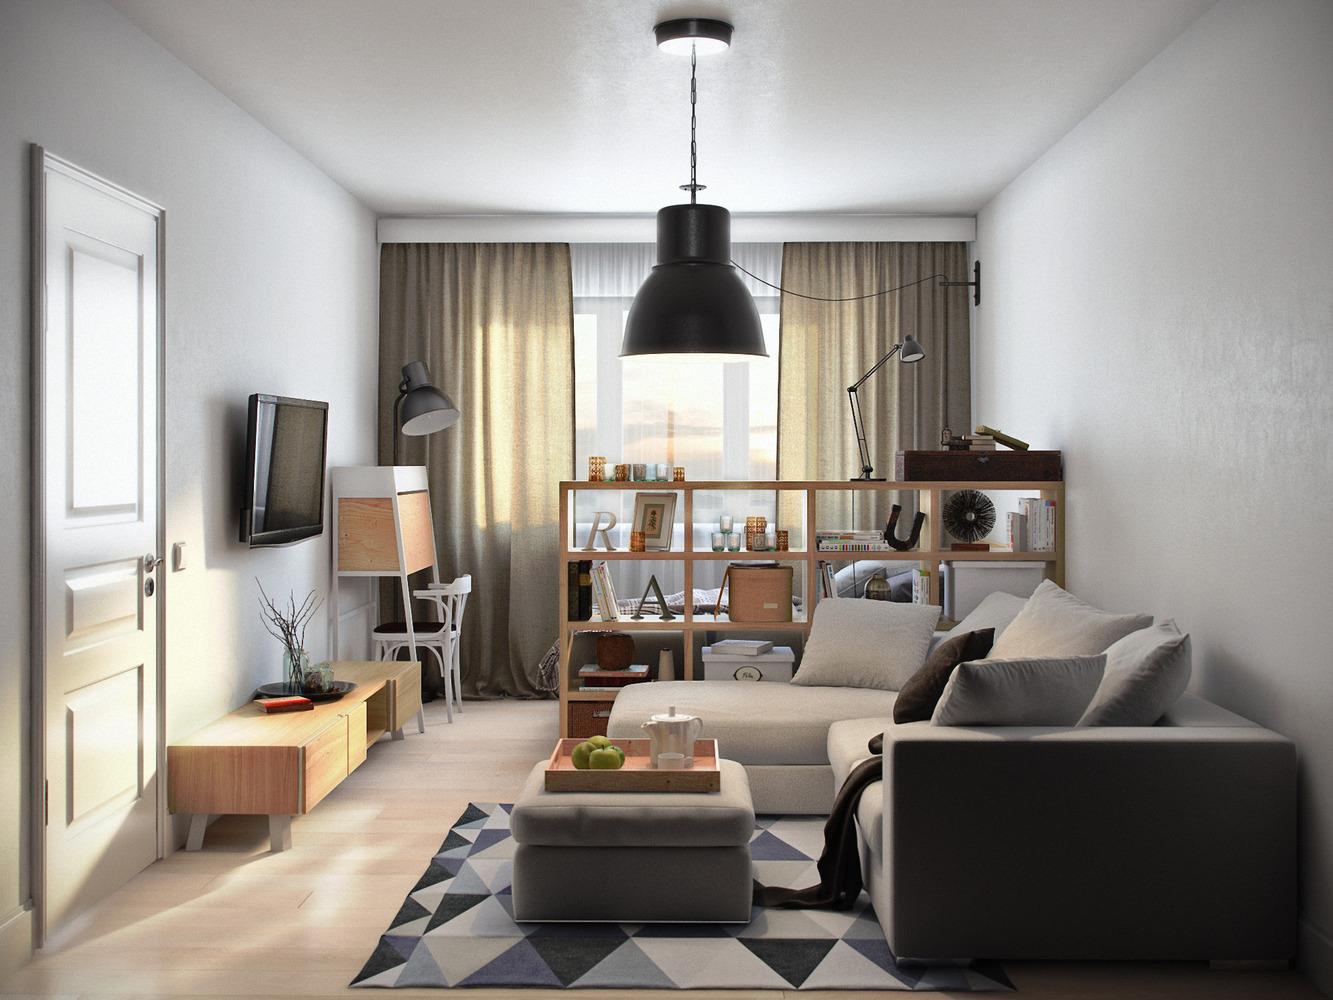 дизайн проект квартиры 36 кв м 1